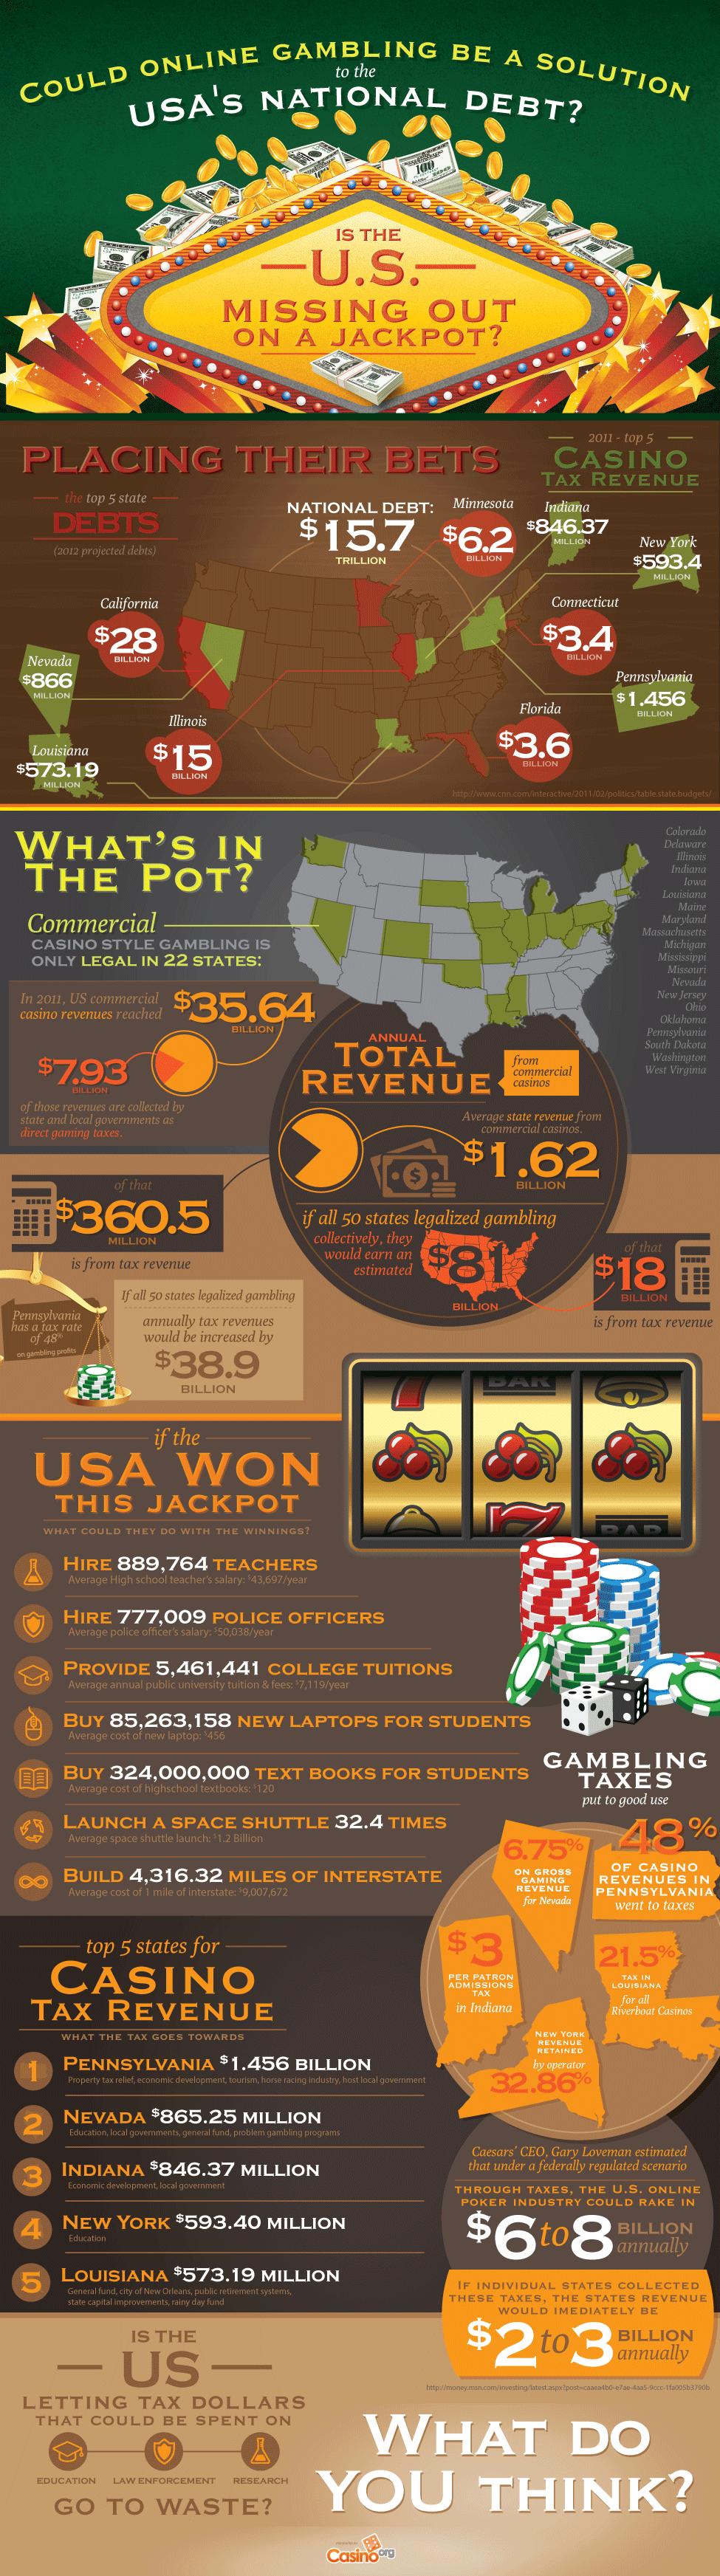 Gambling and the USA National Debt